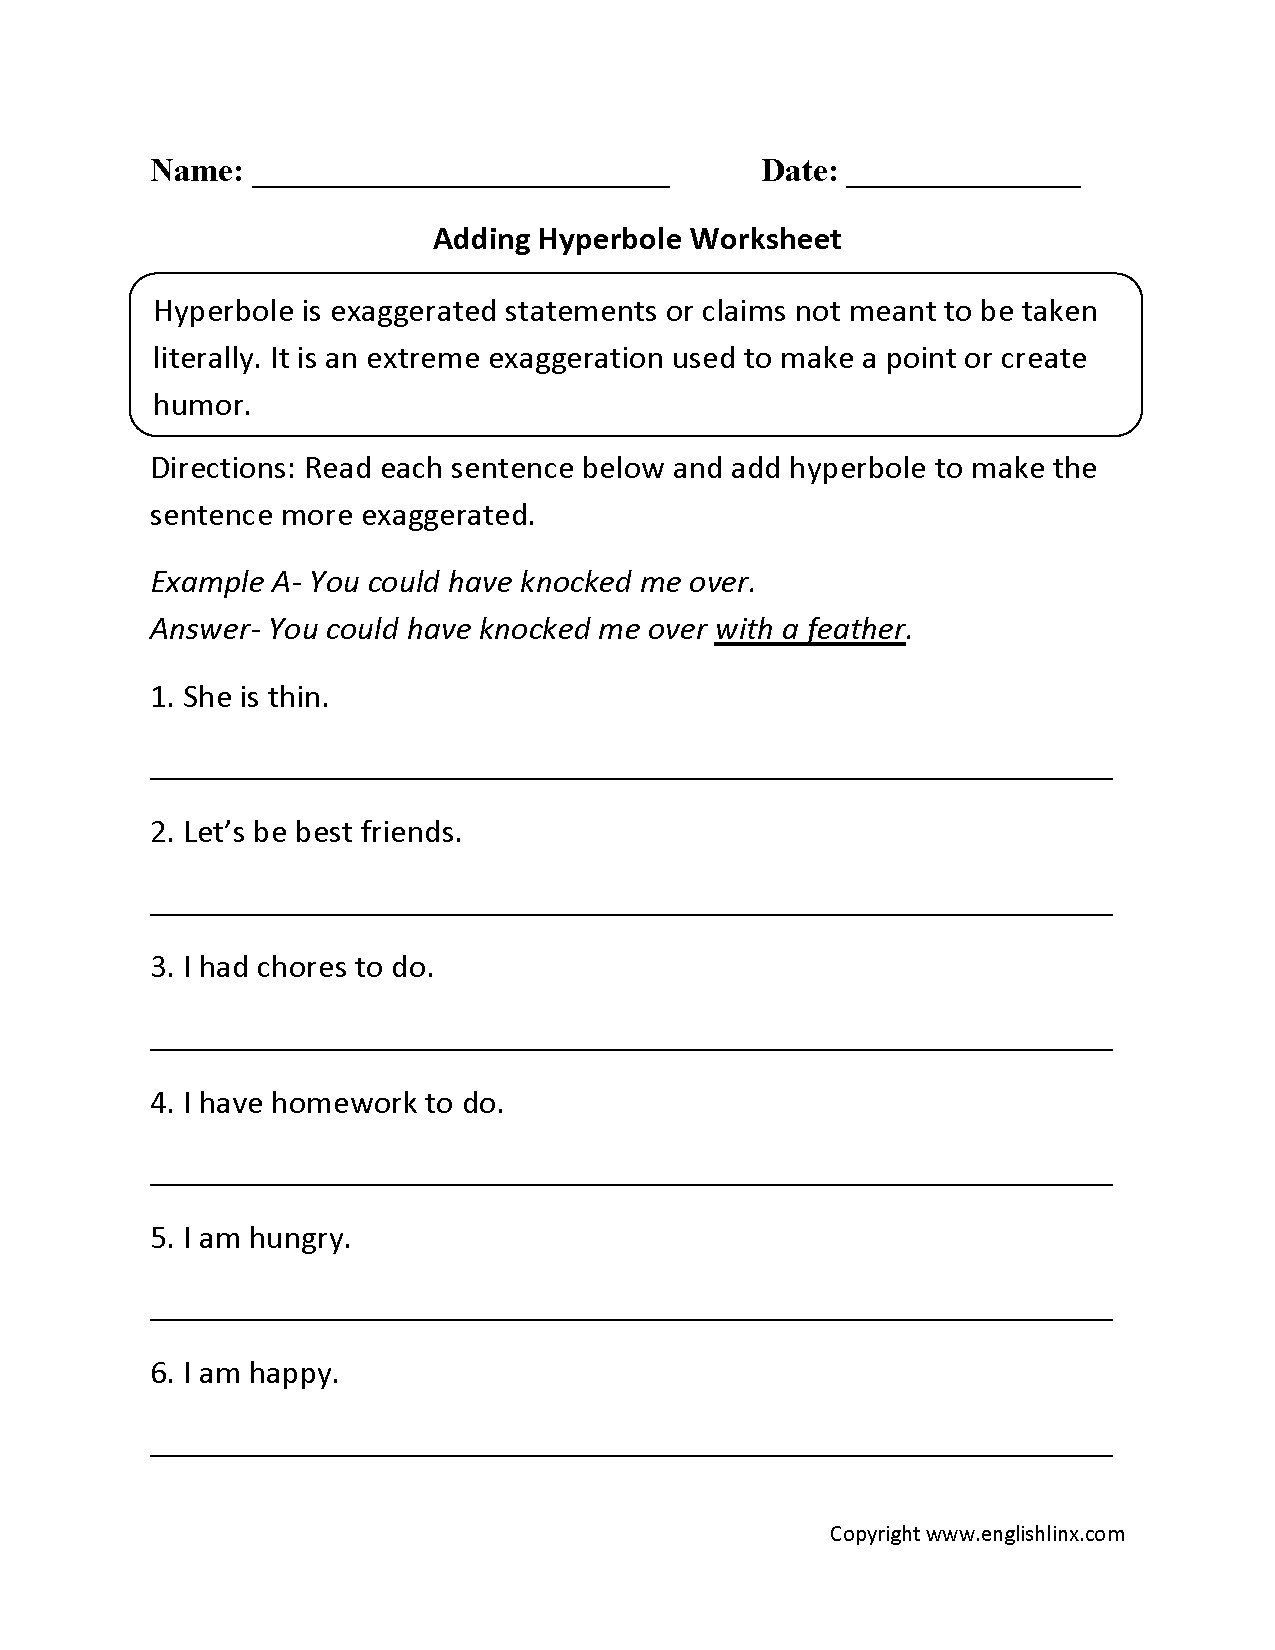 Adding Hyperbole Worksheet